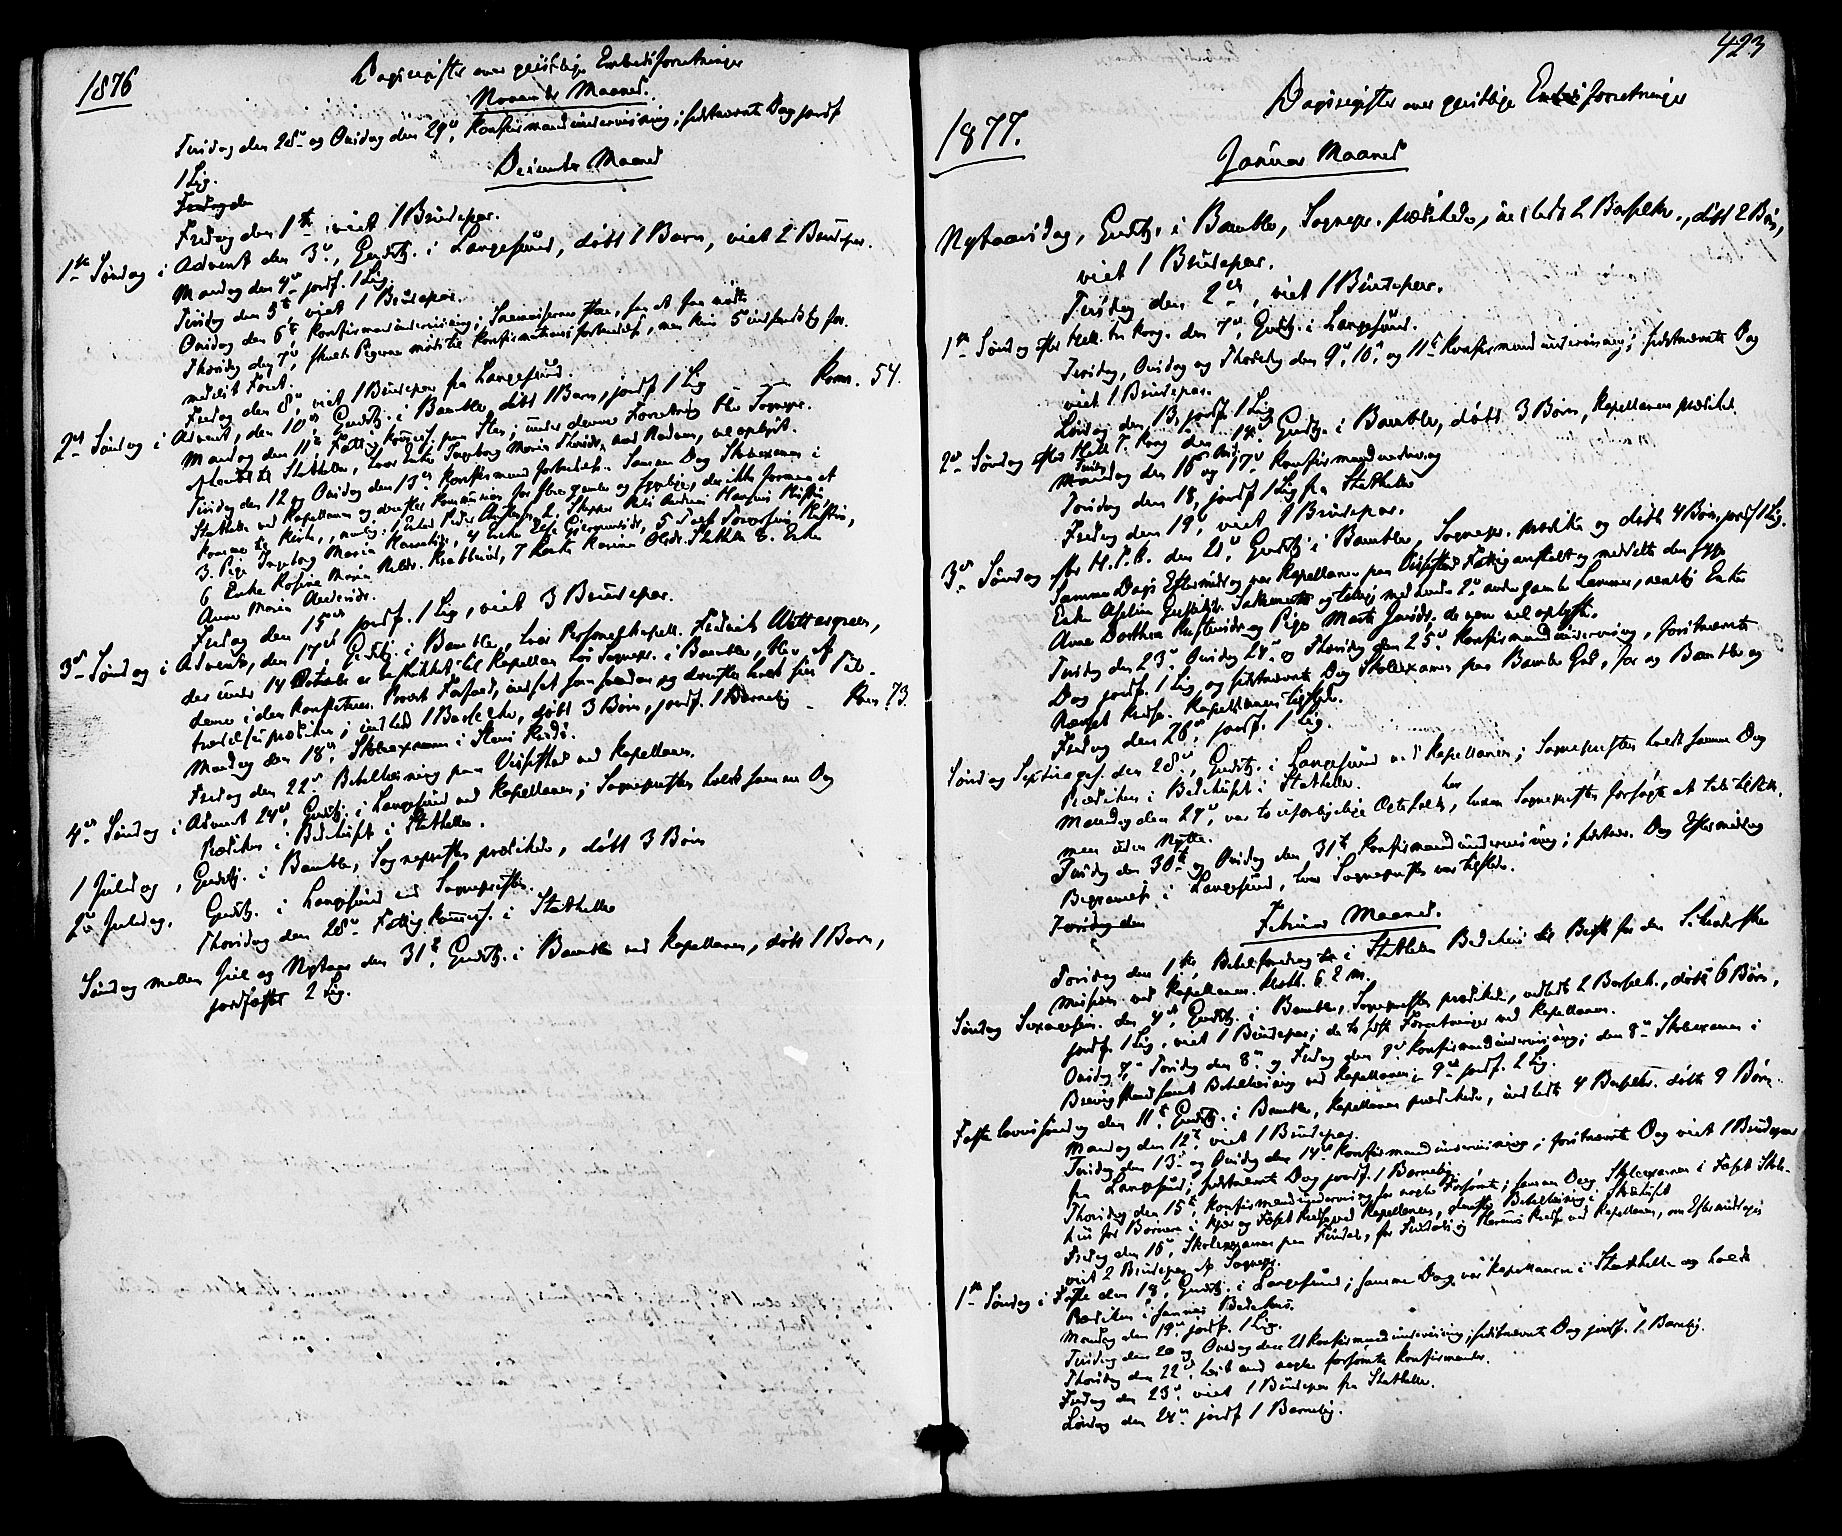 SAKO, Bamble kirkebøker, F/Fa/L0006: Ministerialbok nr. I 6, 1869-1877, s. 423